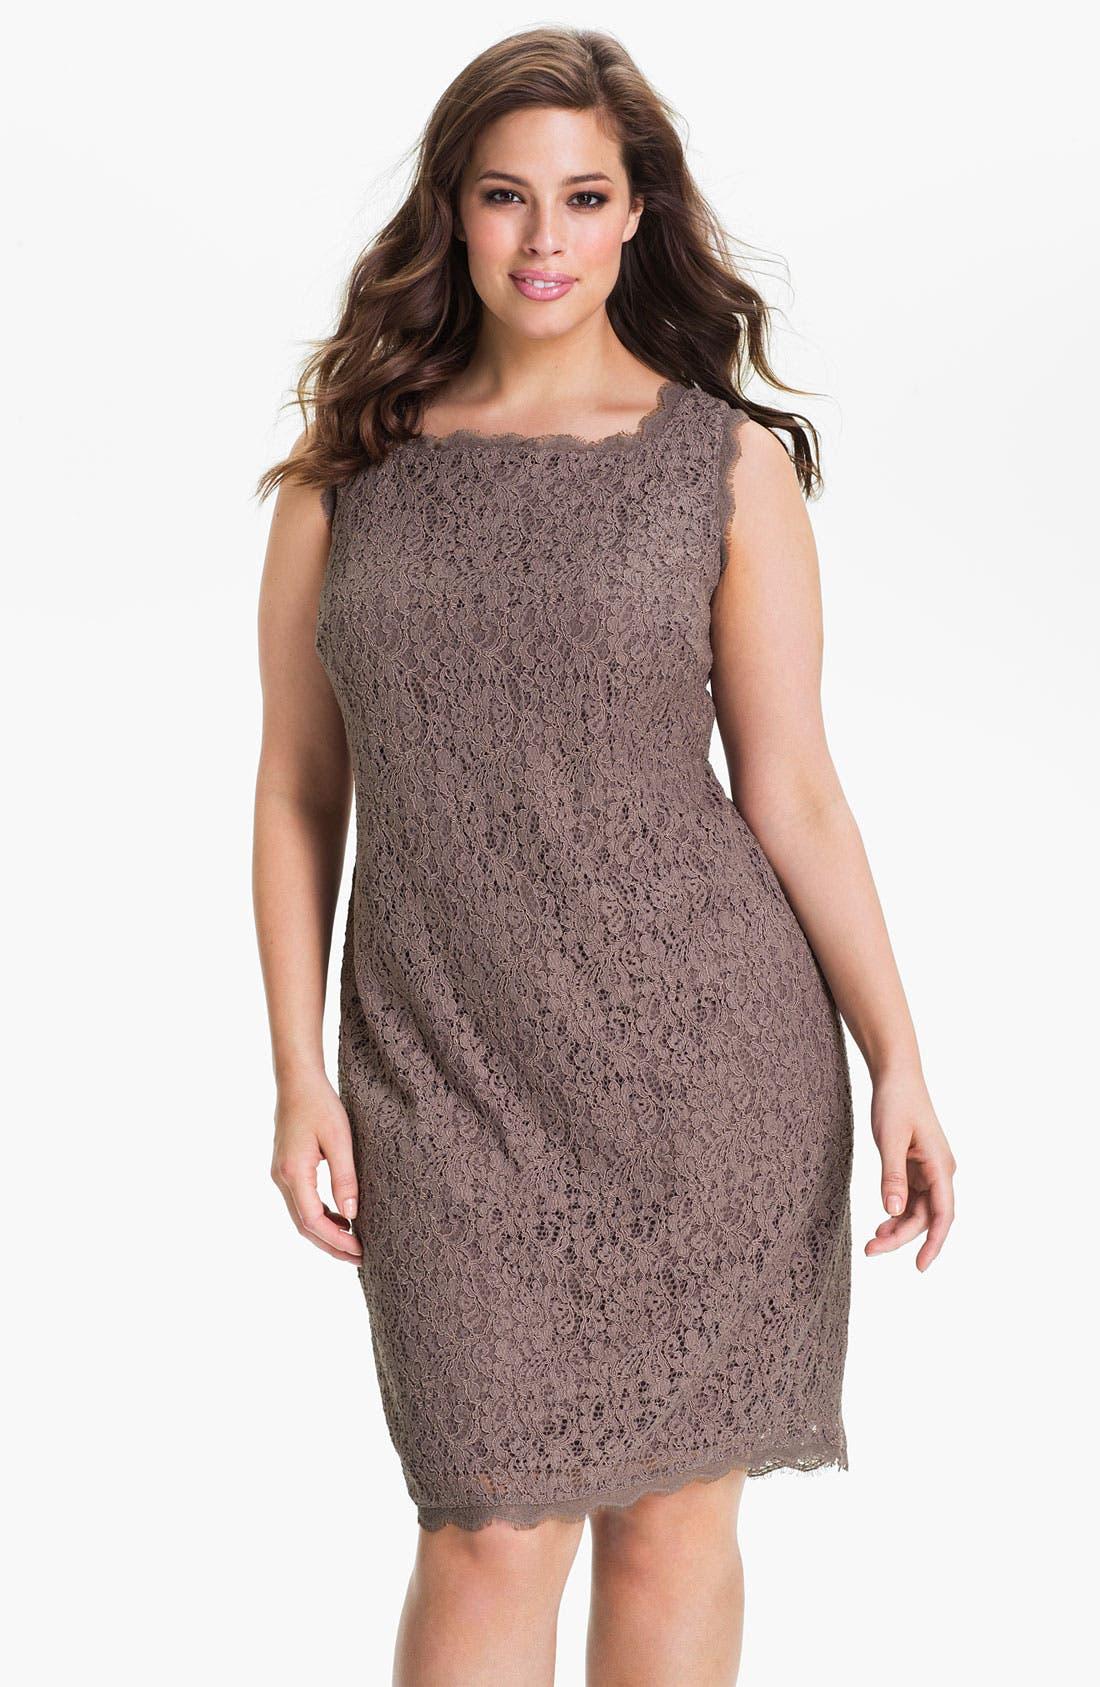 Alternate Image 1 Selected - Adrianna Papell Sleeveless Lace Sheath Dress (Plus Size)